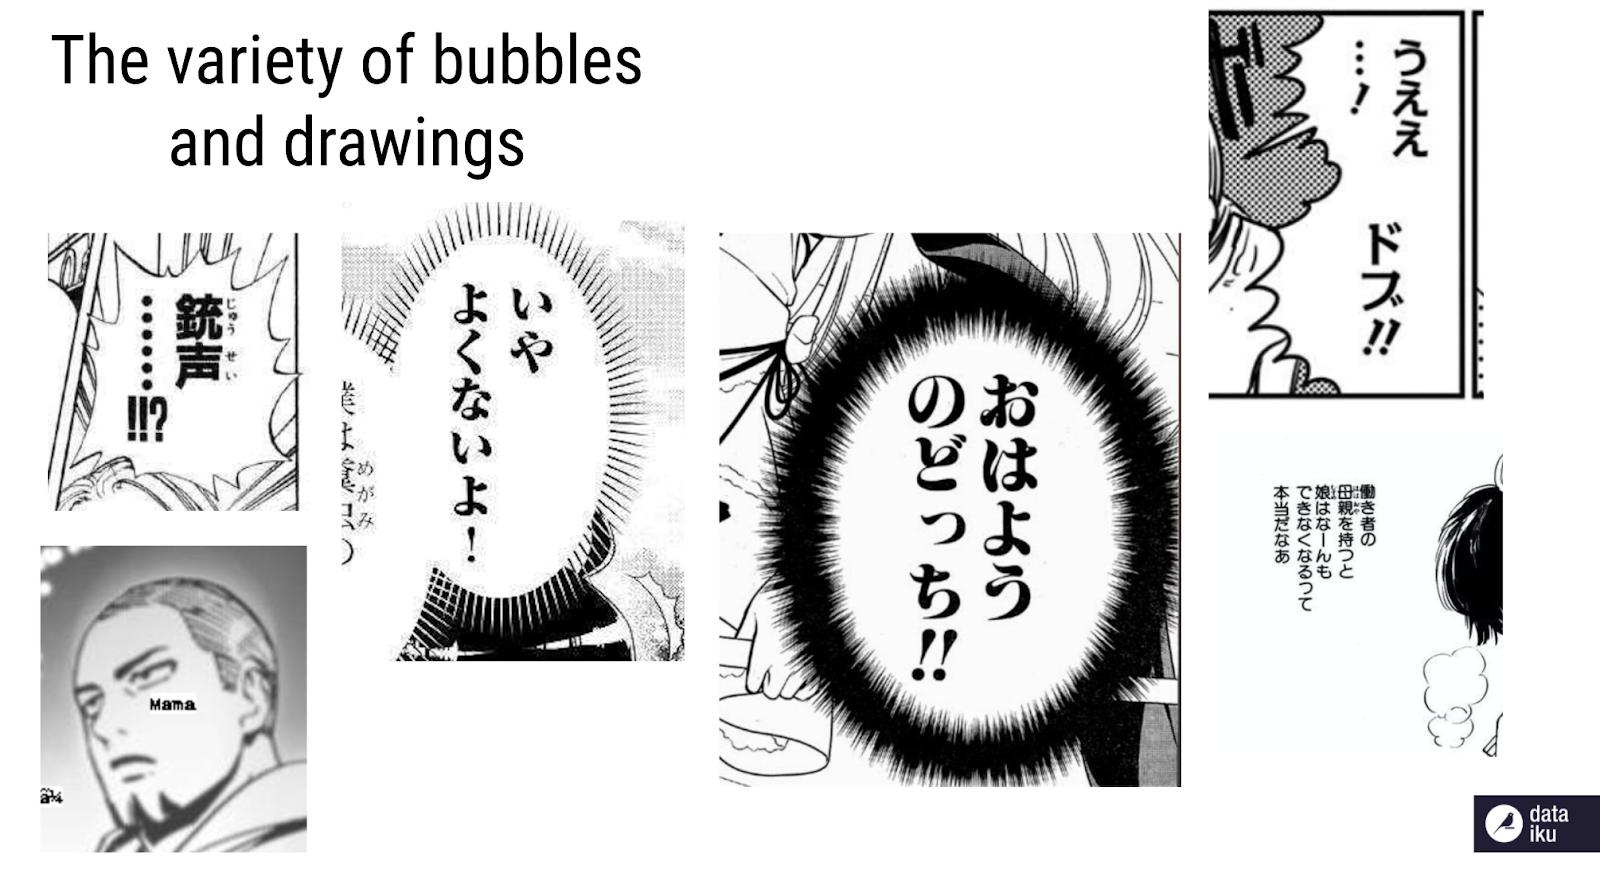 examples of mangaka surrounding dialogues creativity